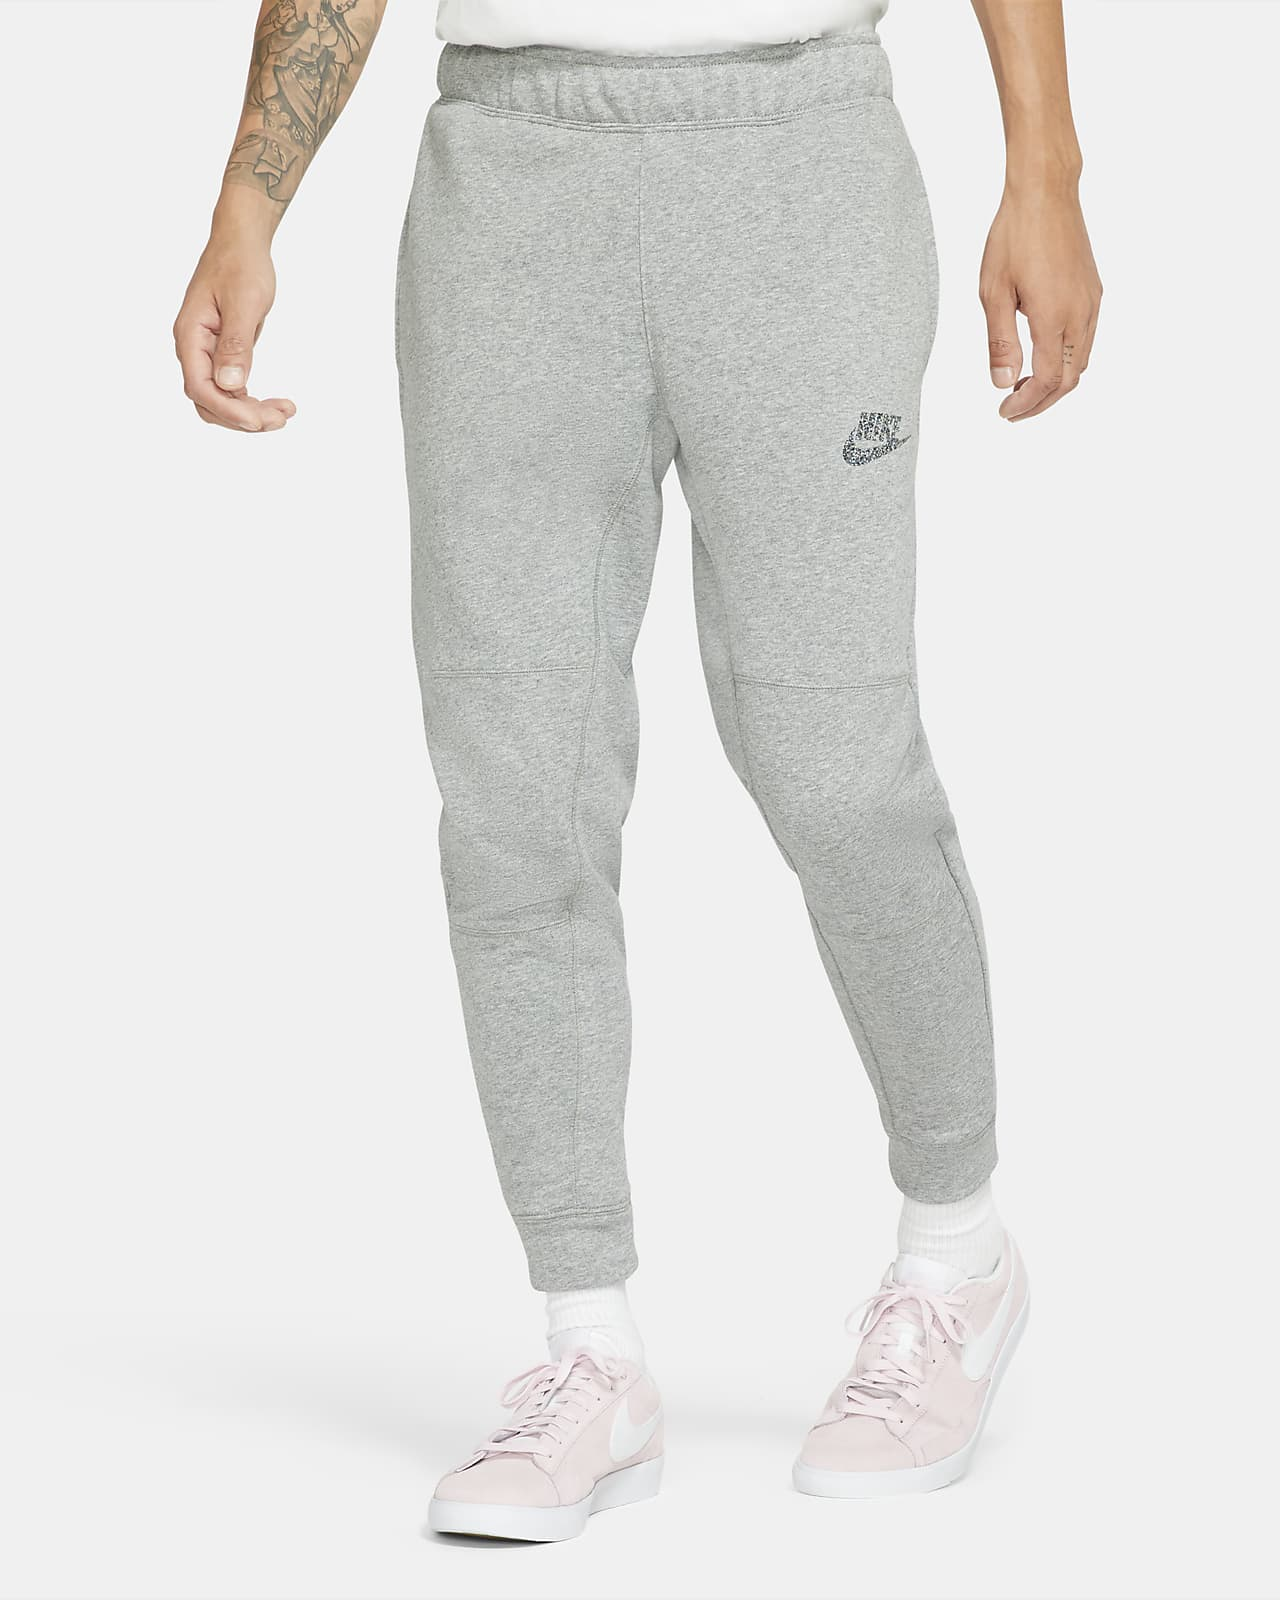 Nike Sportswear Men's Joggers. Nike PH